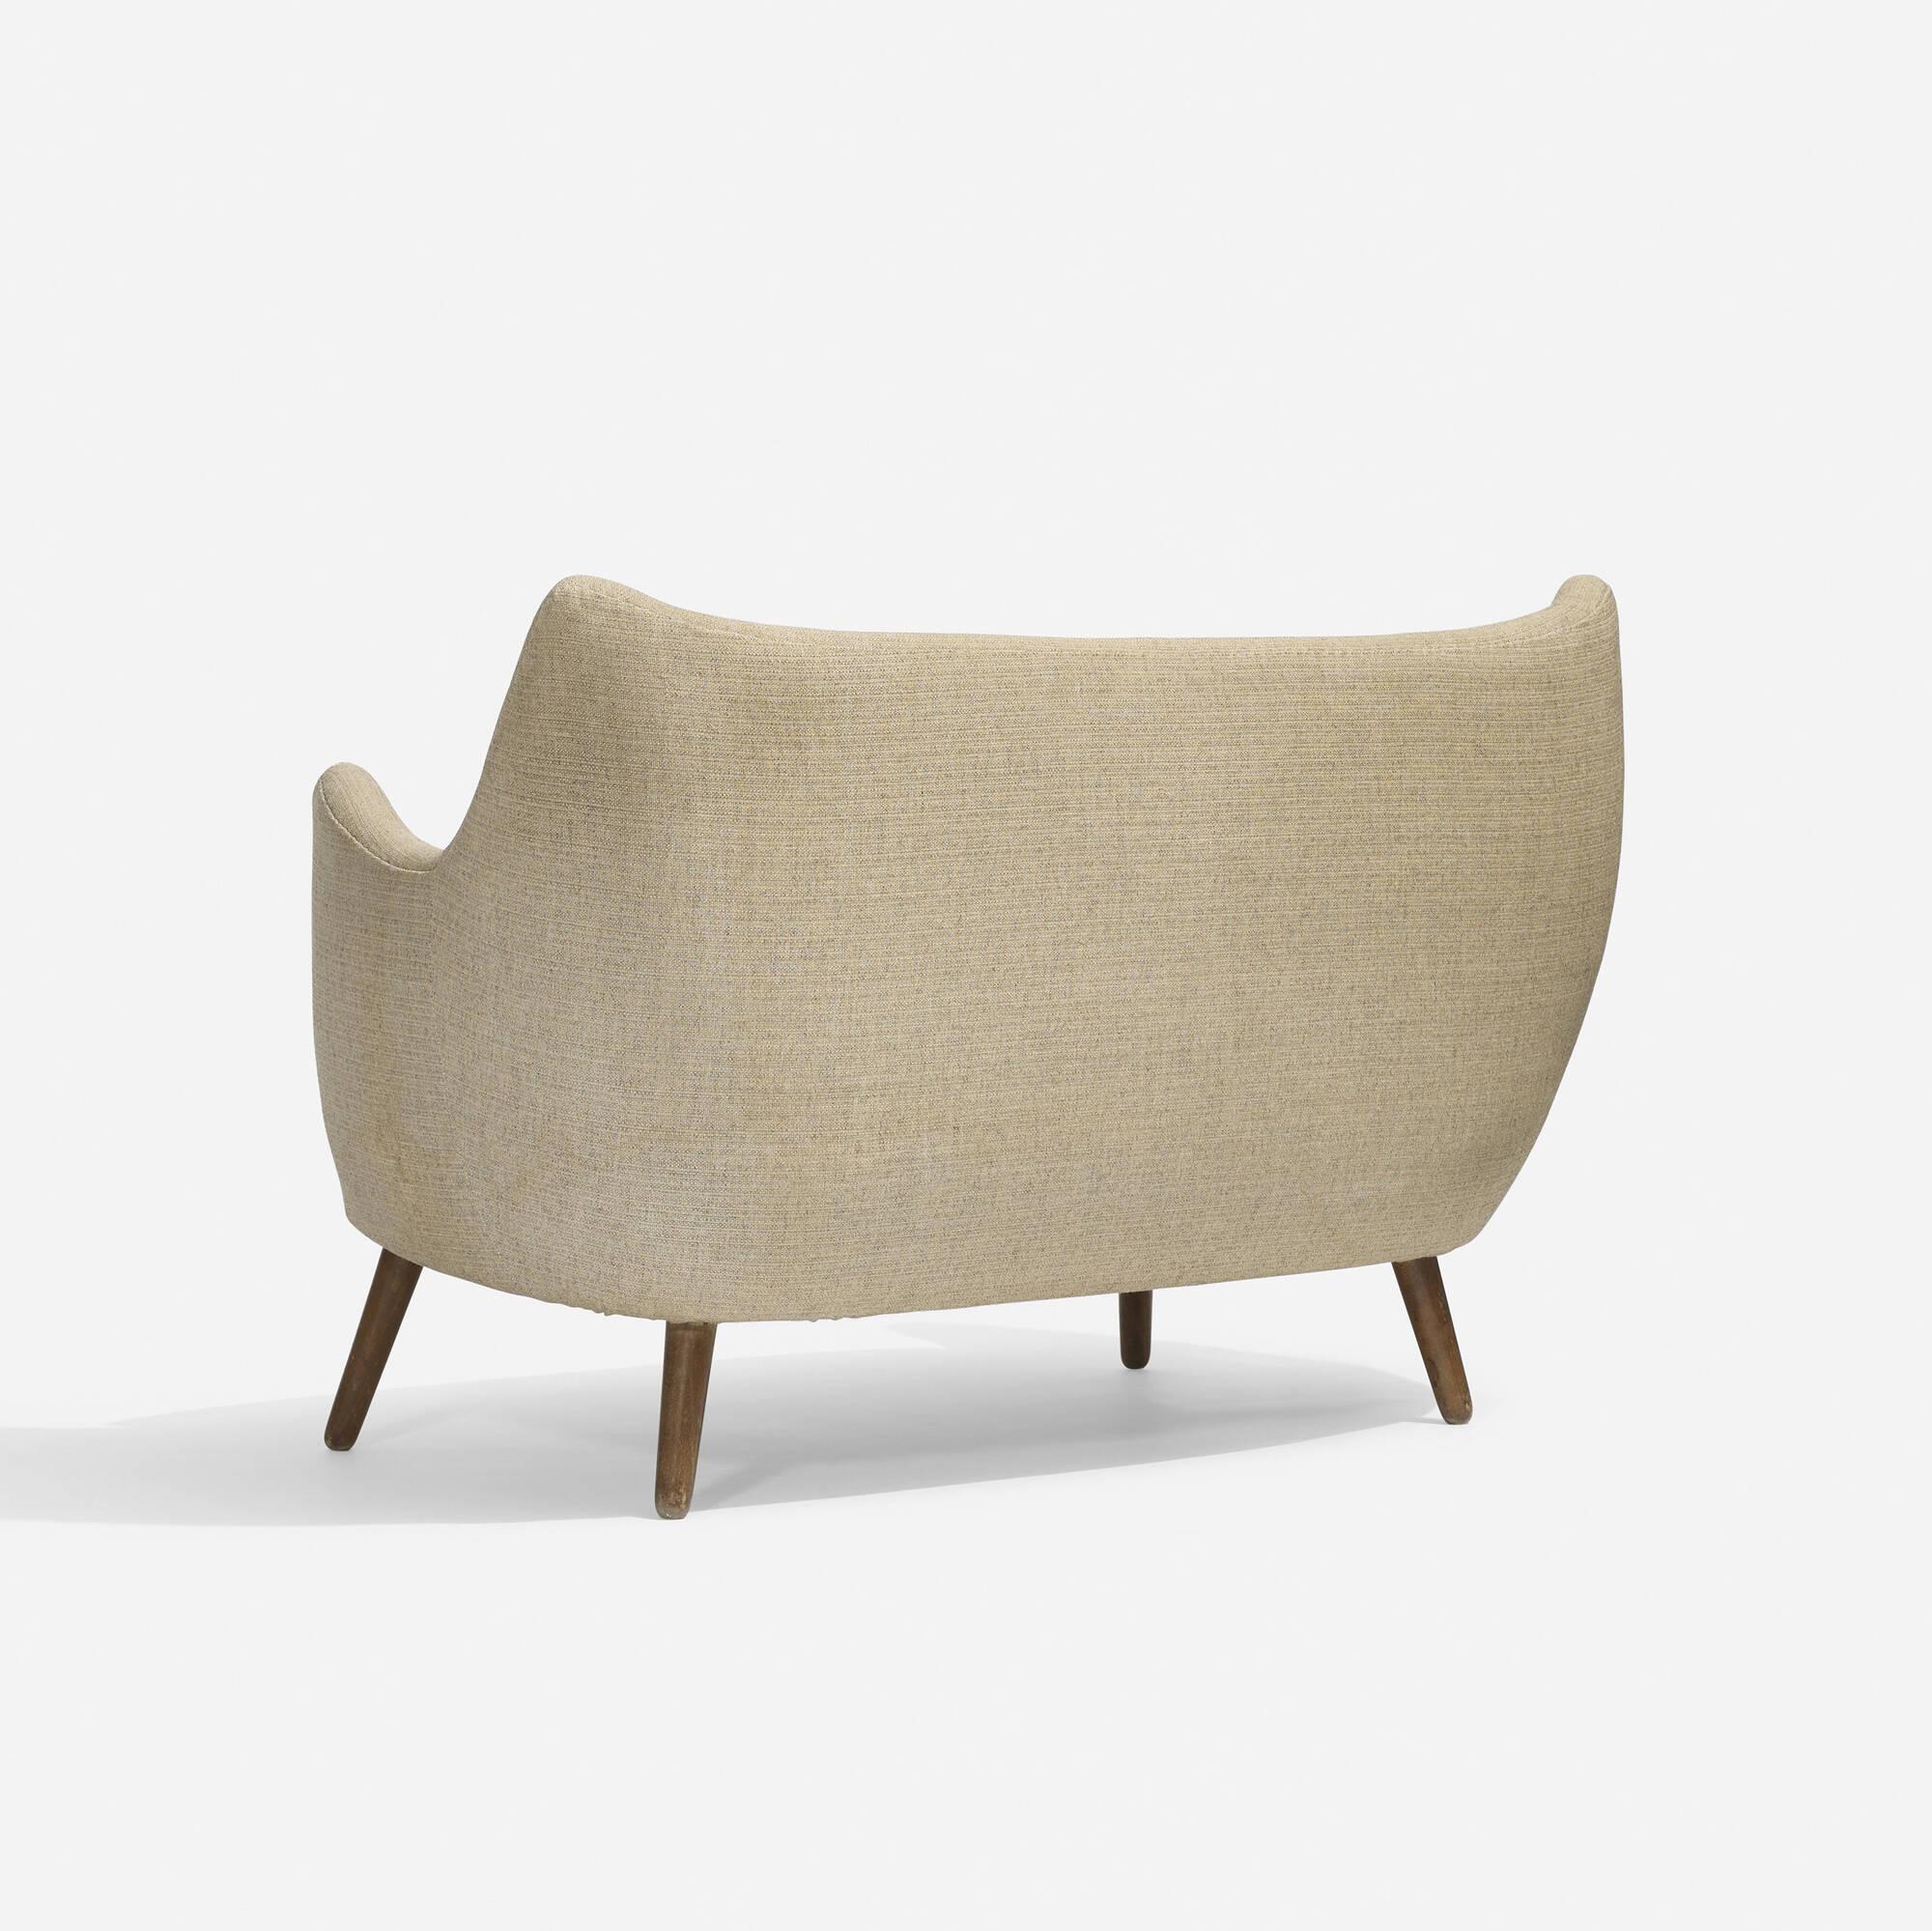 finn juhl poet sofa sale plexigl table 112